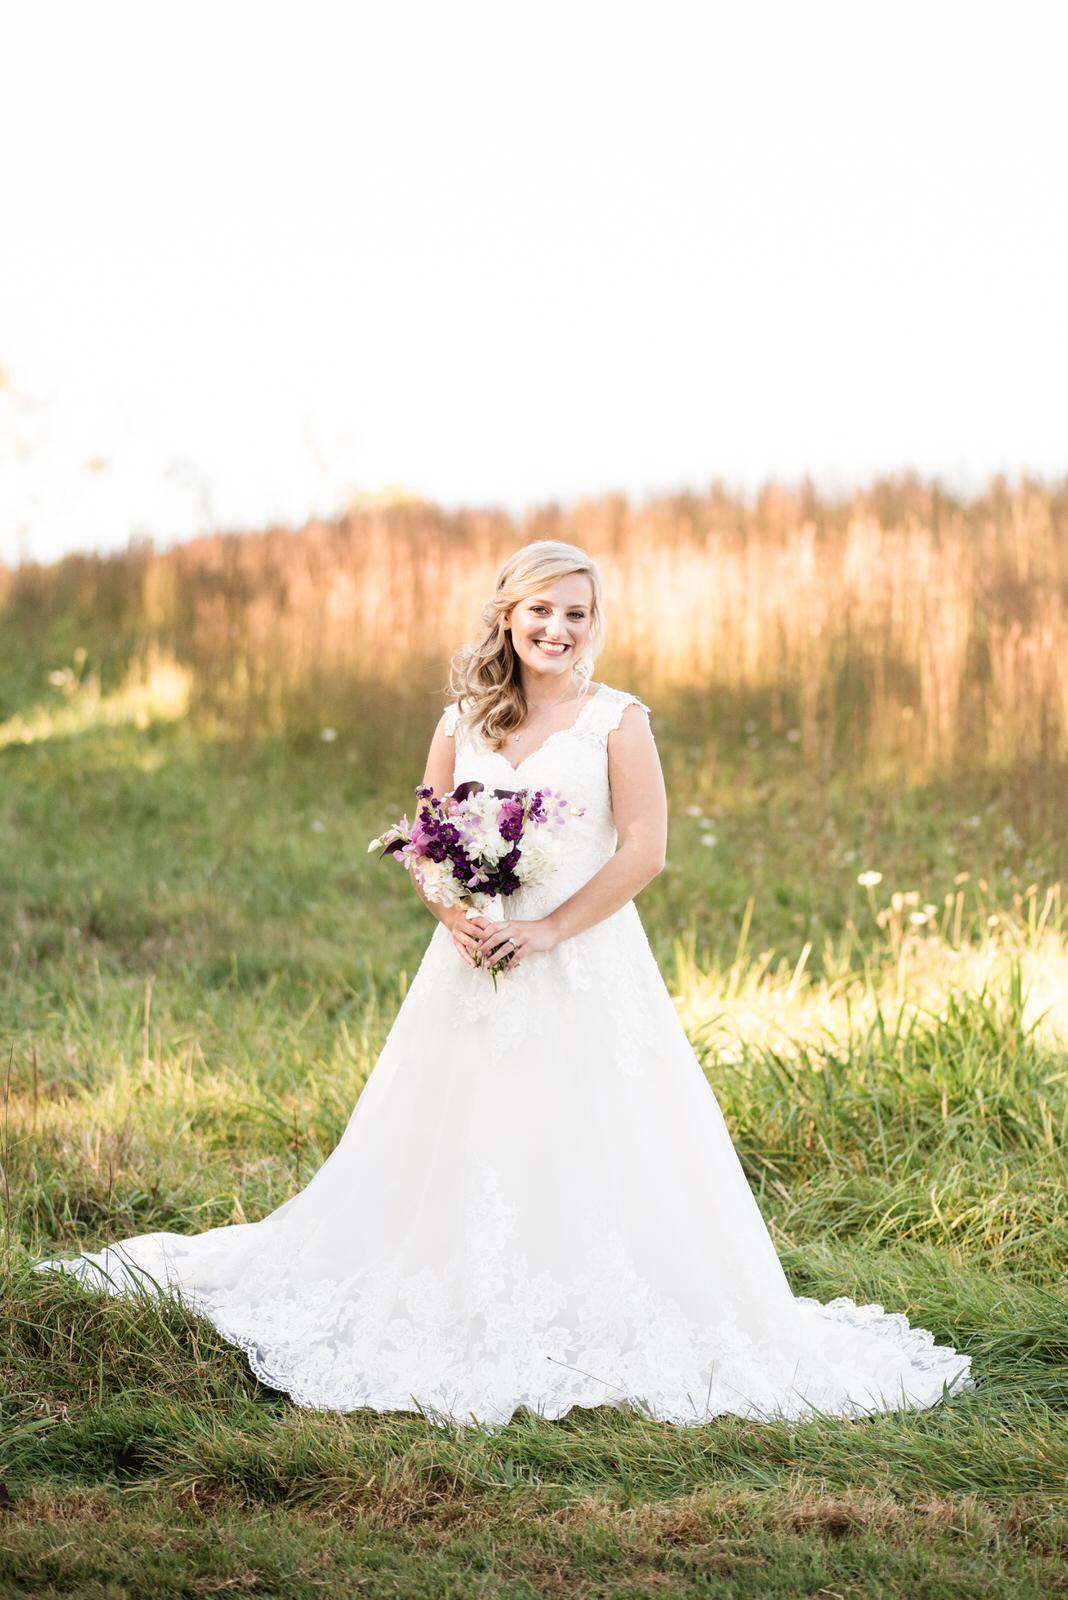 wedding_at_red_fox_winery_wedding_photographer031.jpg